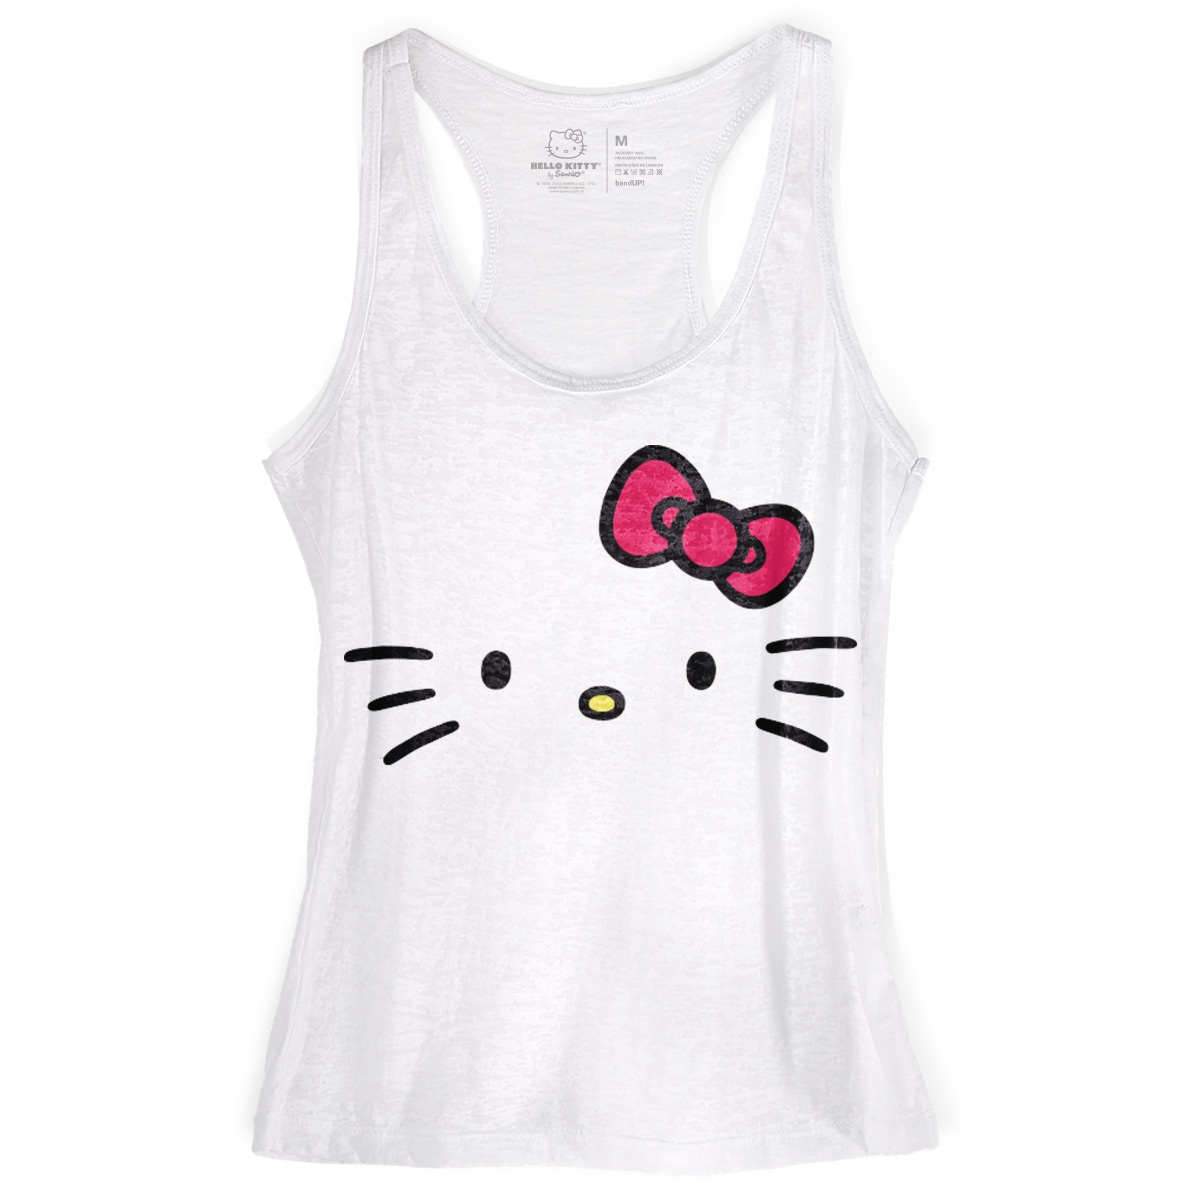 Regata Nadador Feminina Hello Kitty White